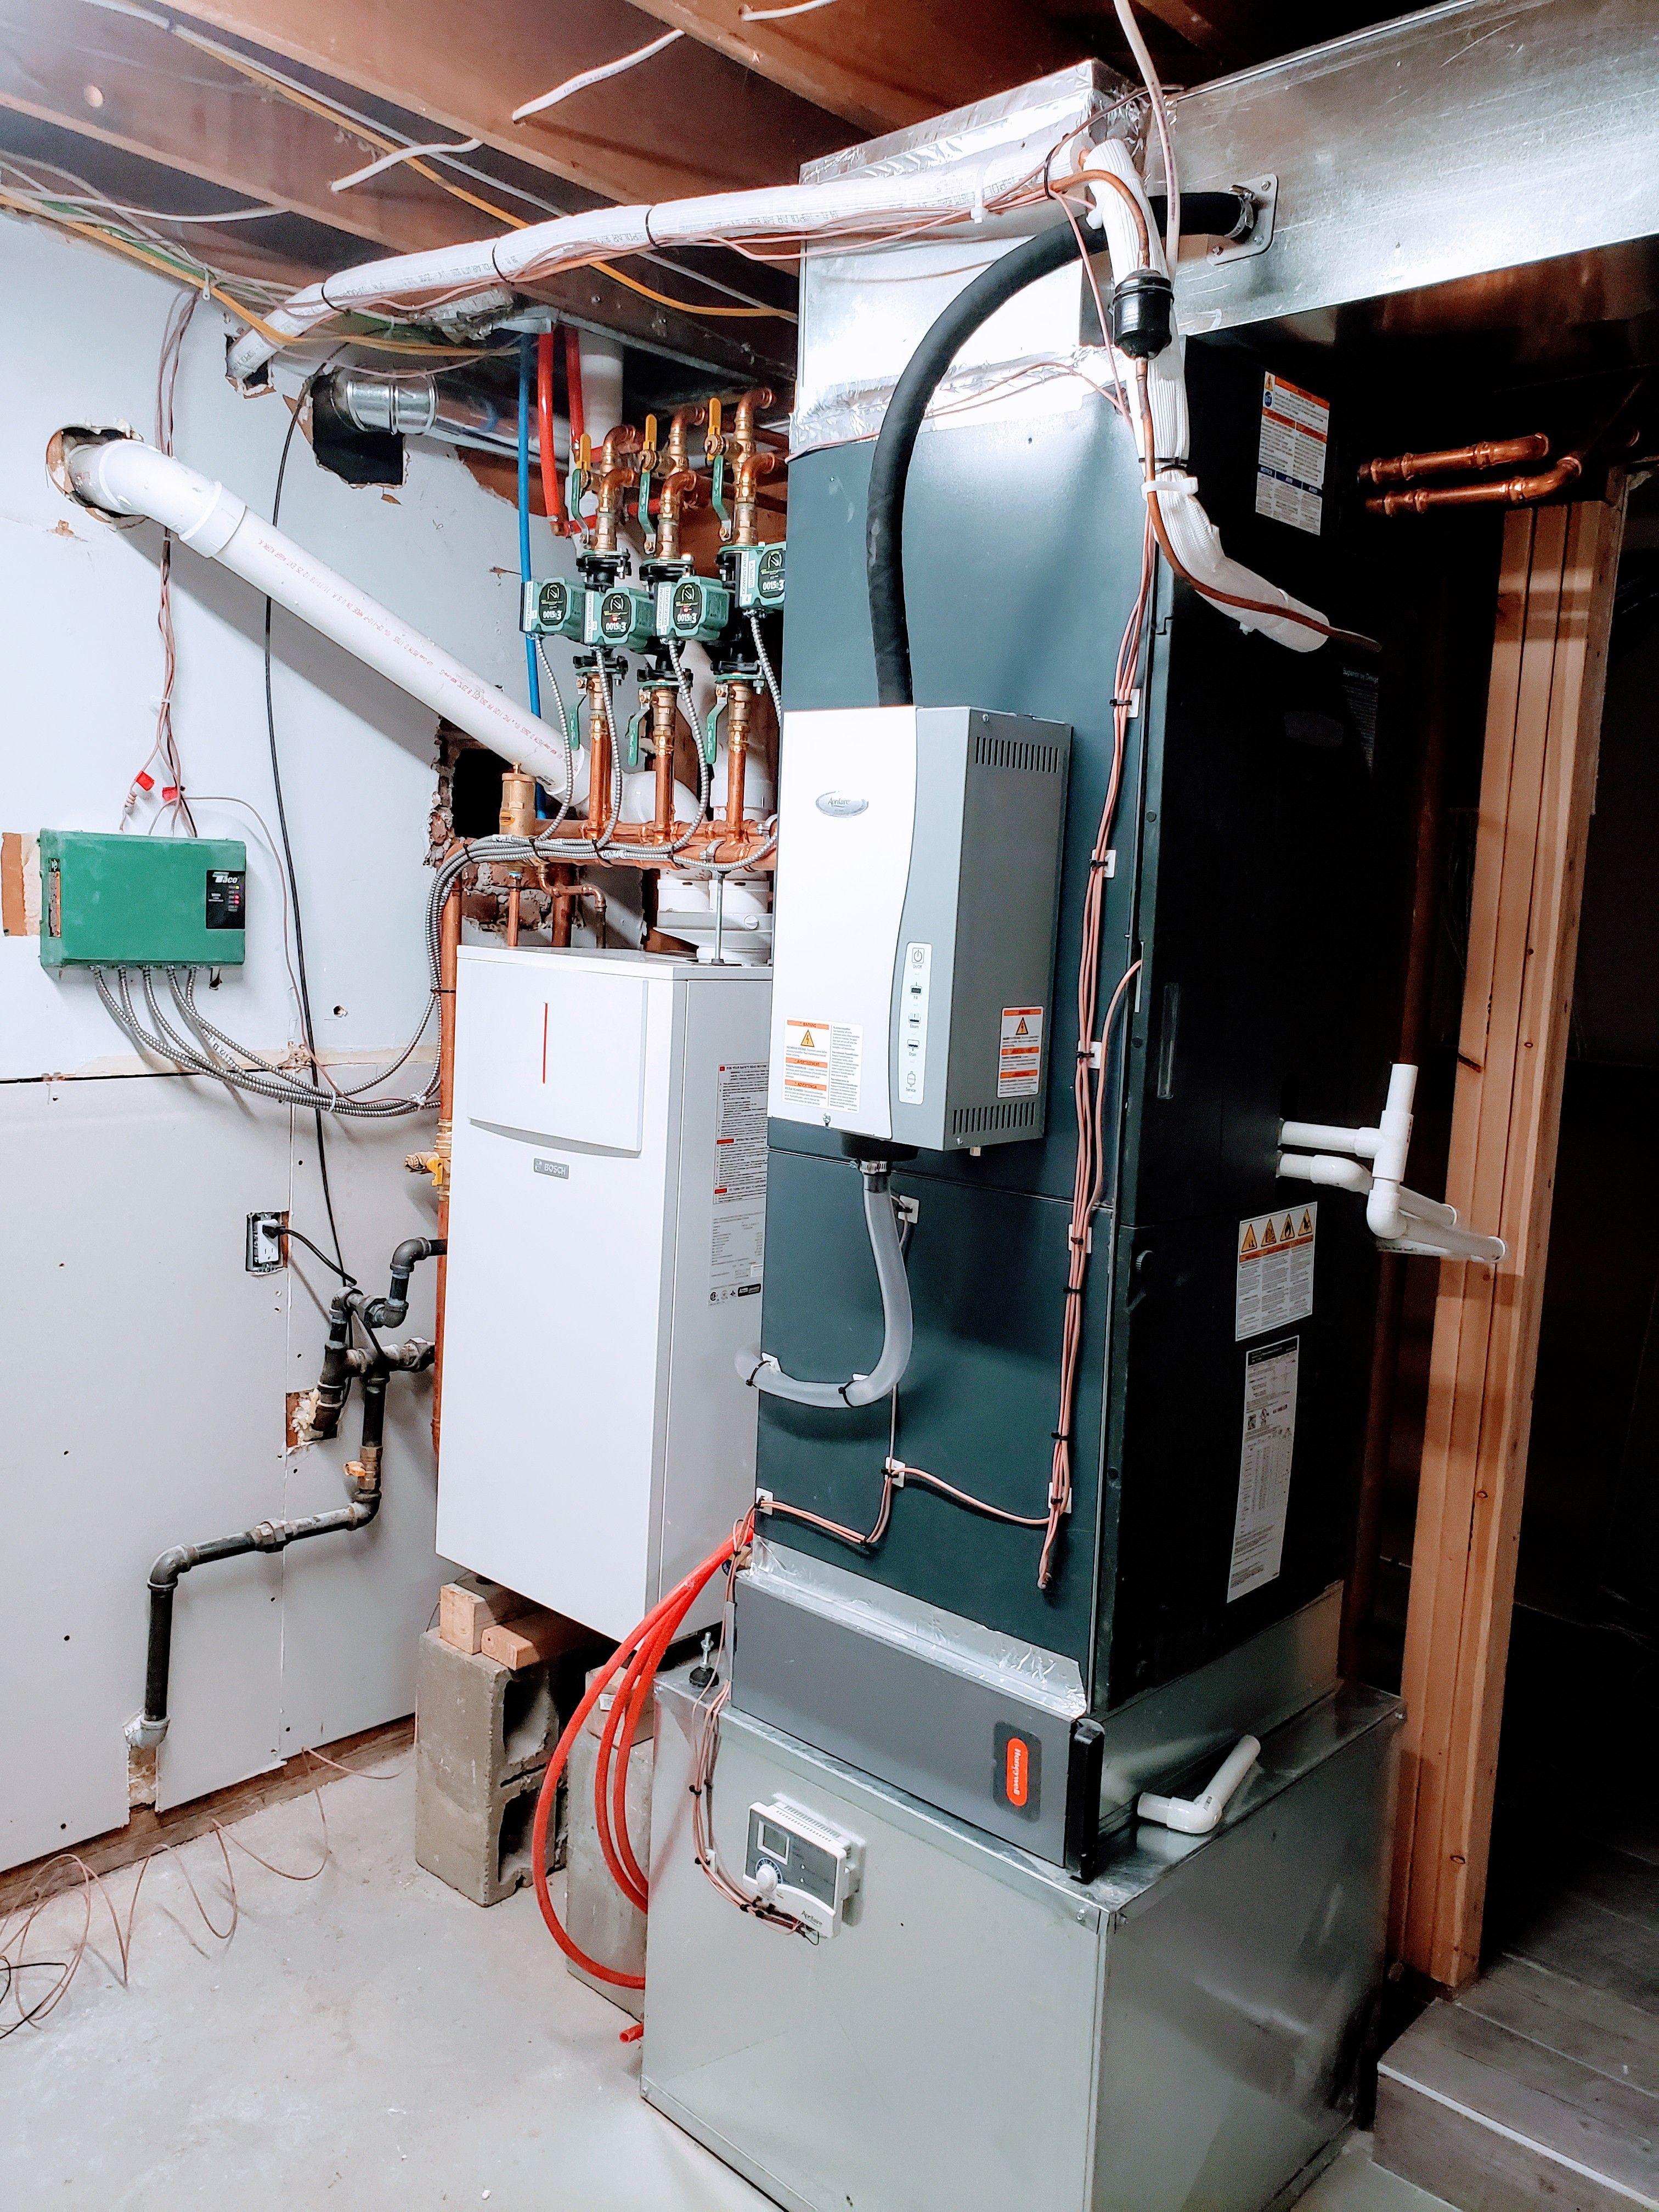 Jetaircompany Installing Insane Residential Hvac System Including